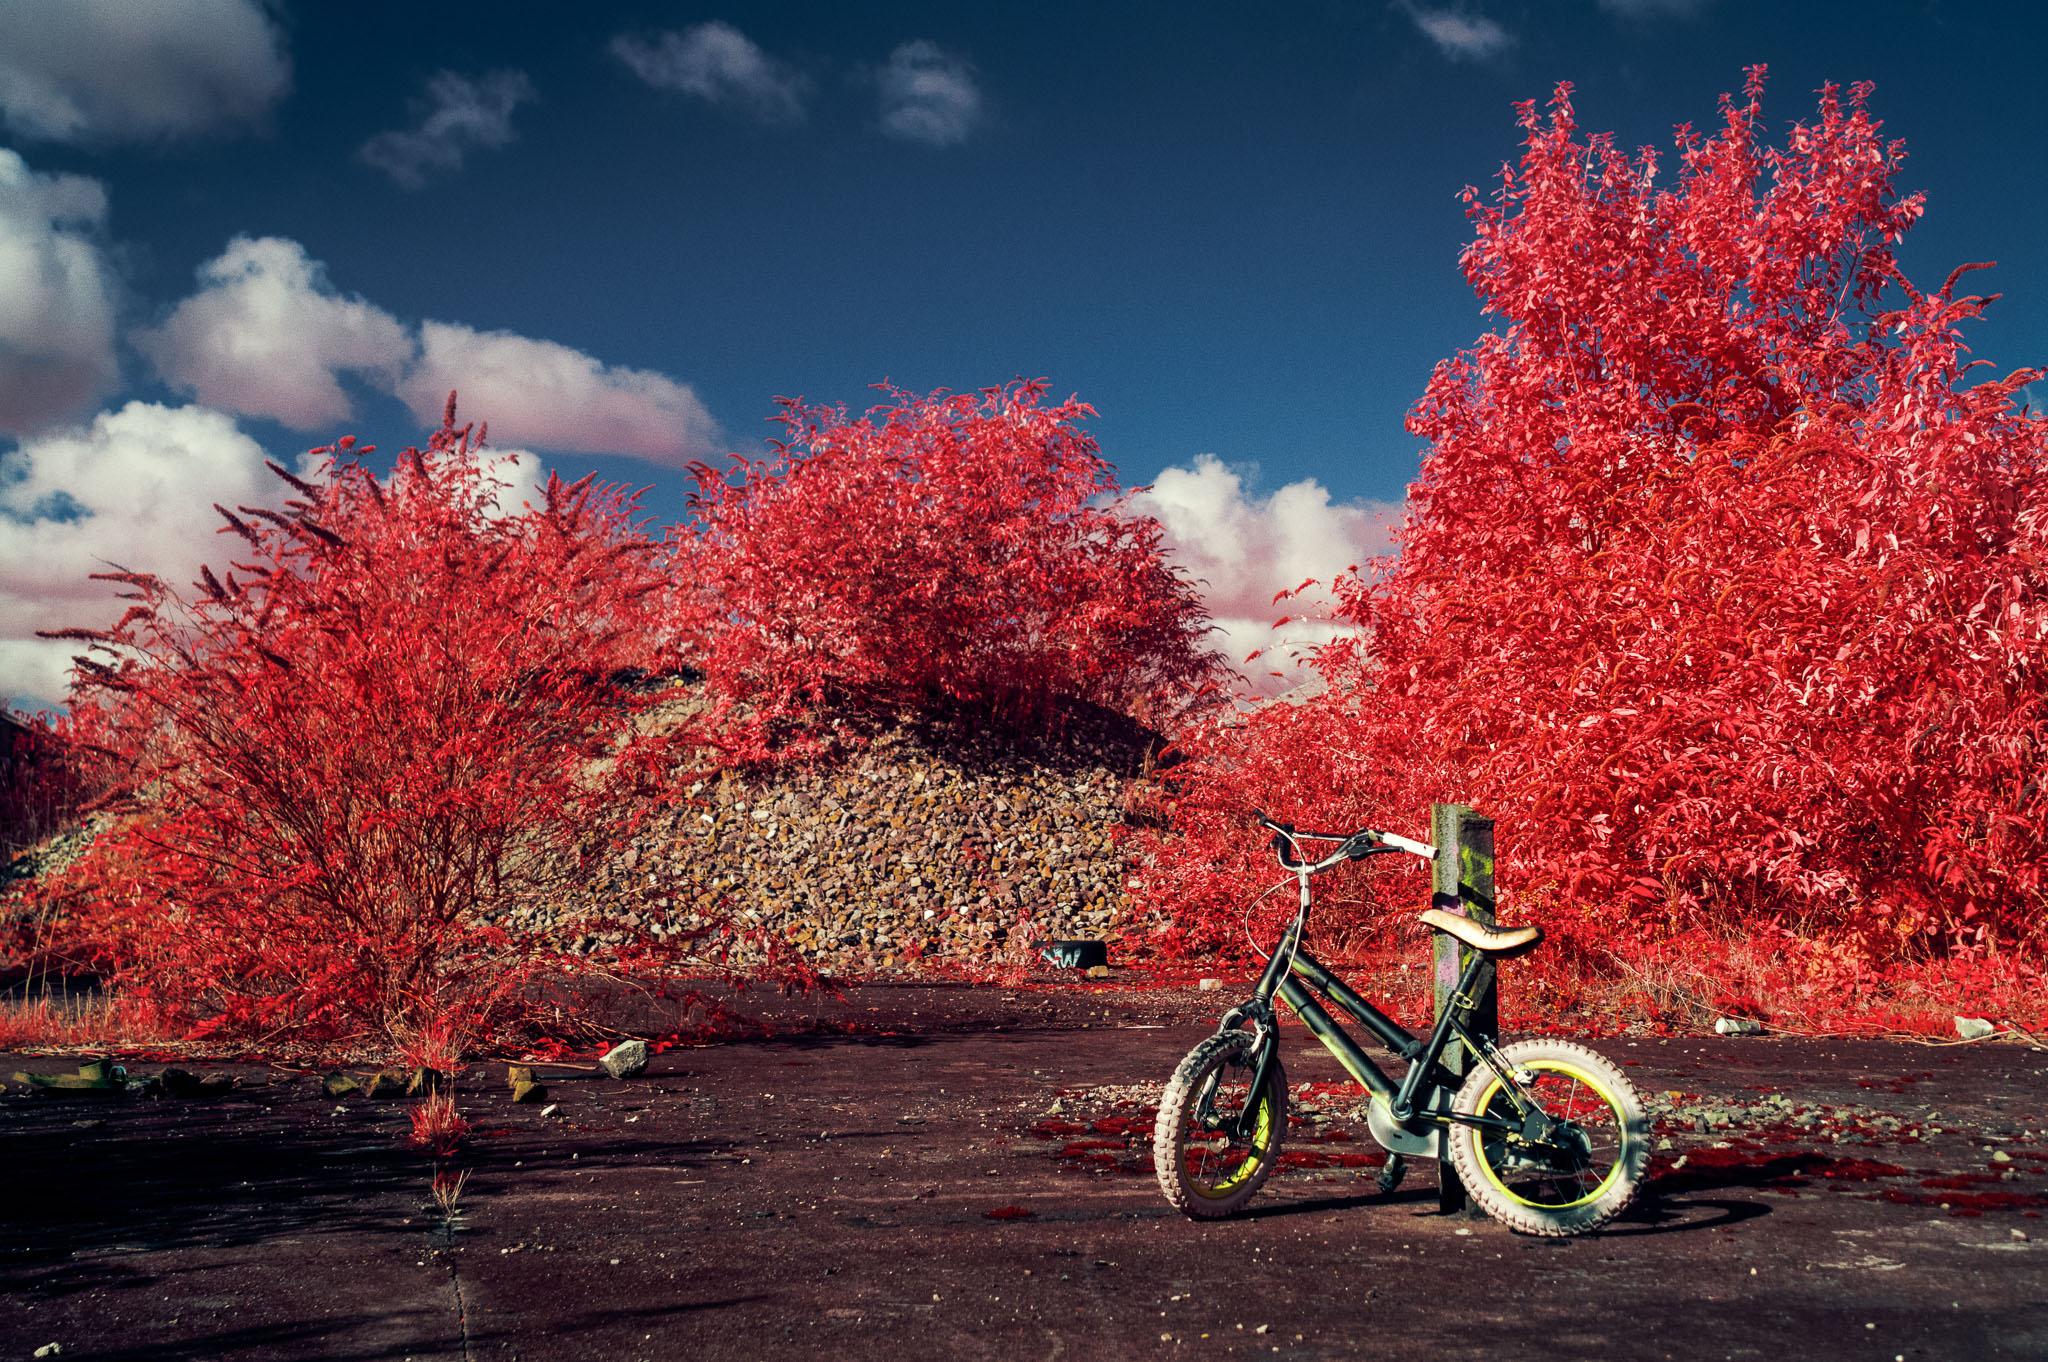 Kodak EIR Colour Infrared, Edgelands, Wasteland, Out of sight,  Bike